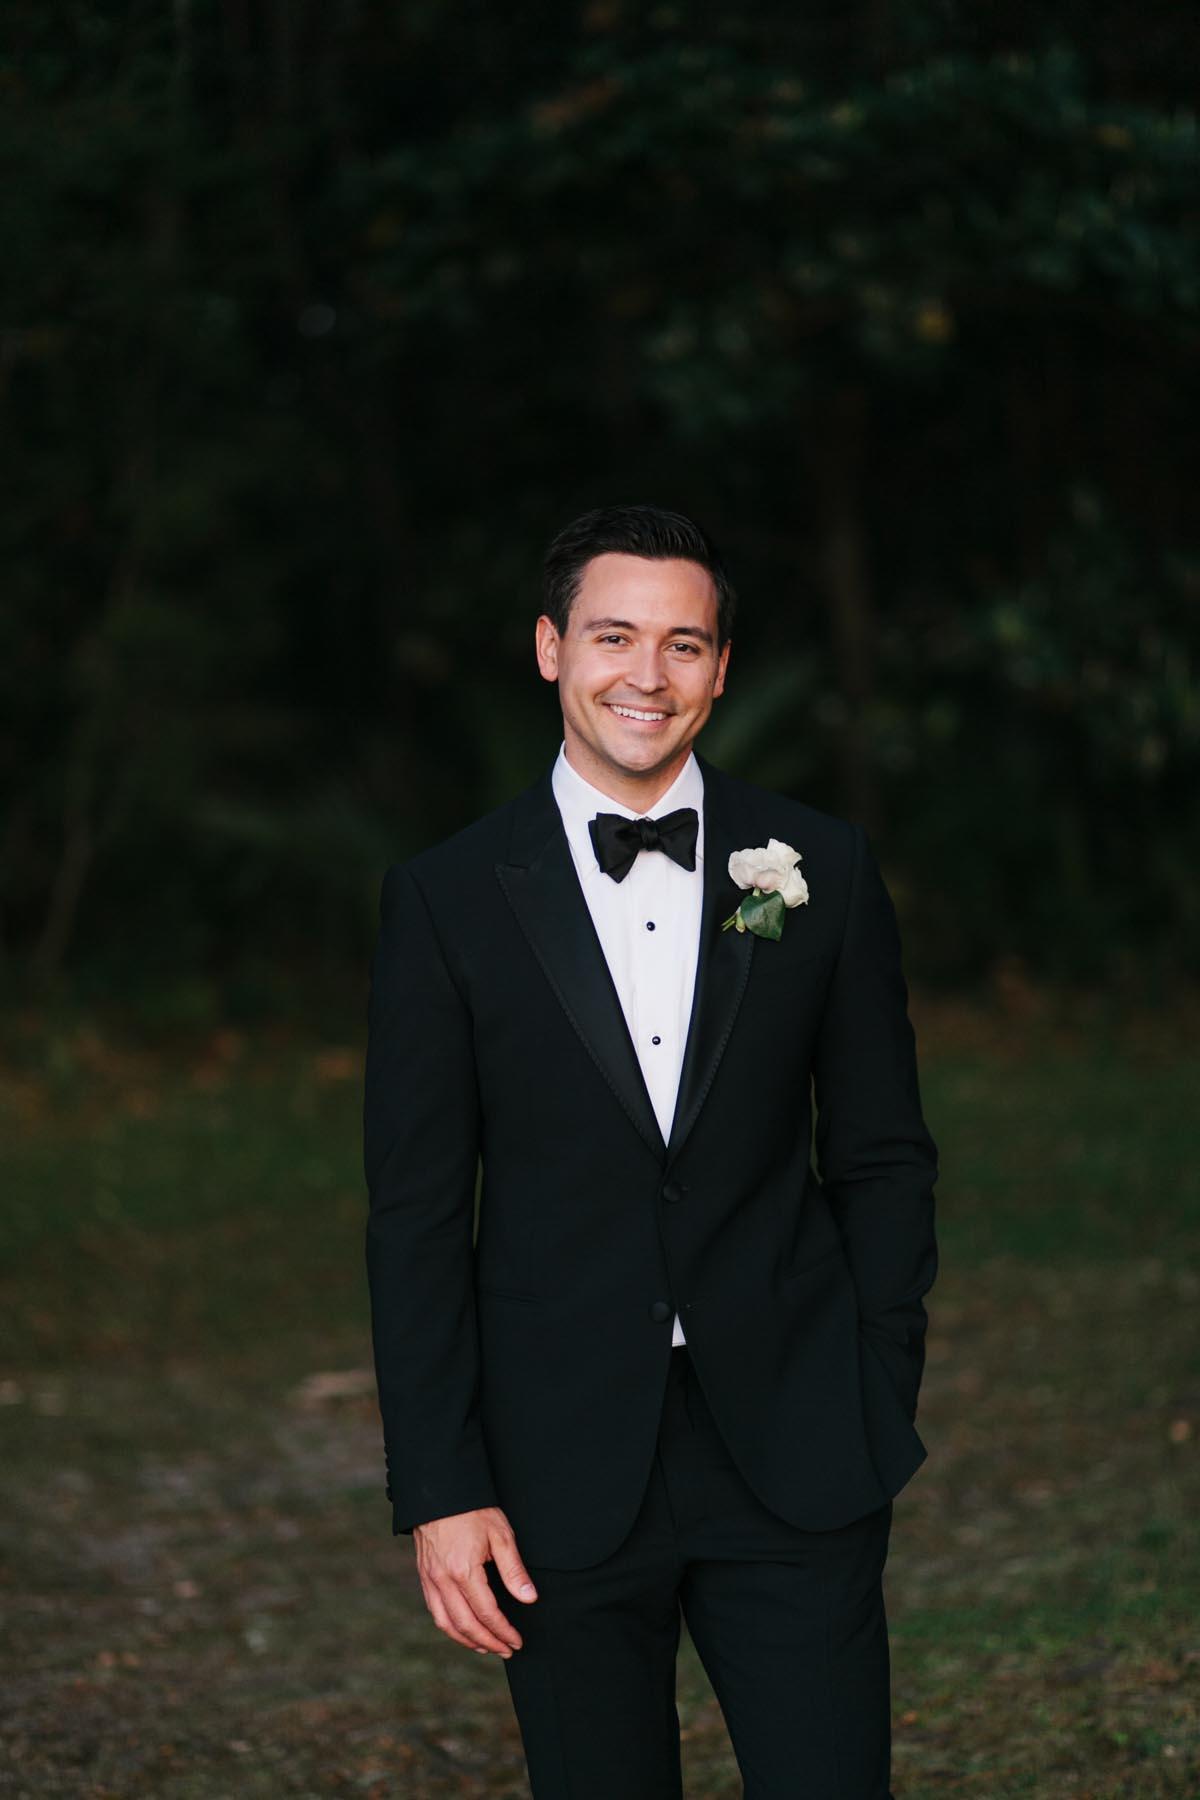 lowry wedding blog eden garden florida wedding-98